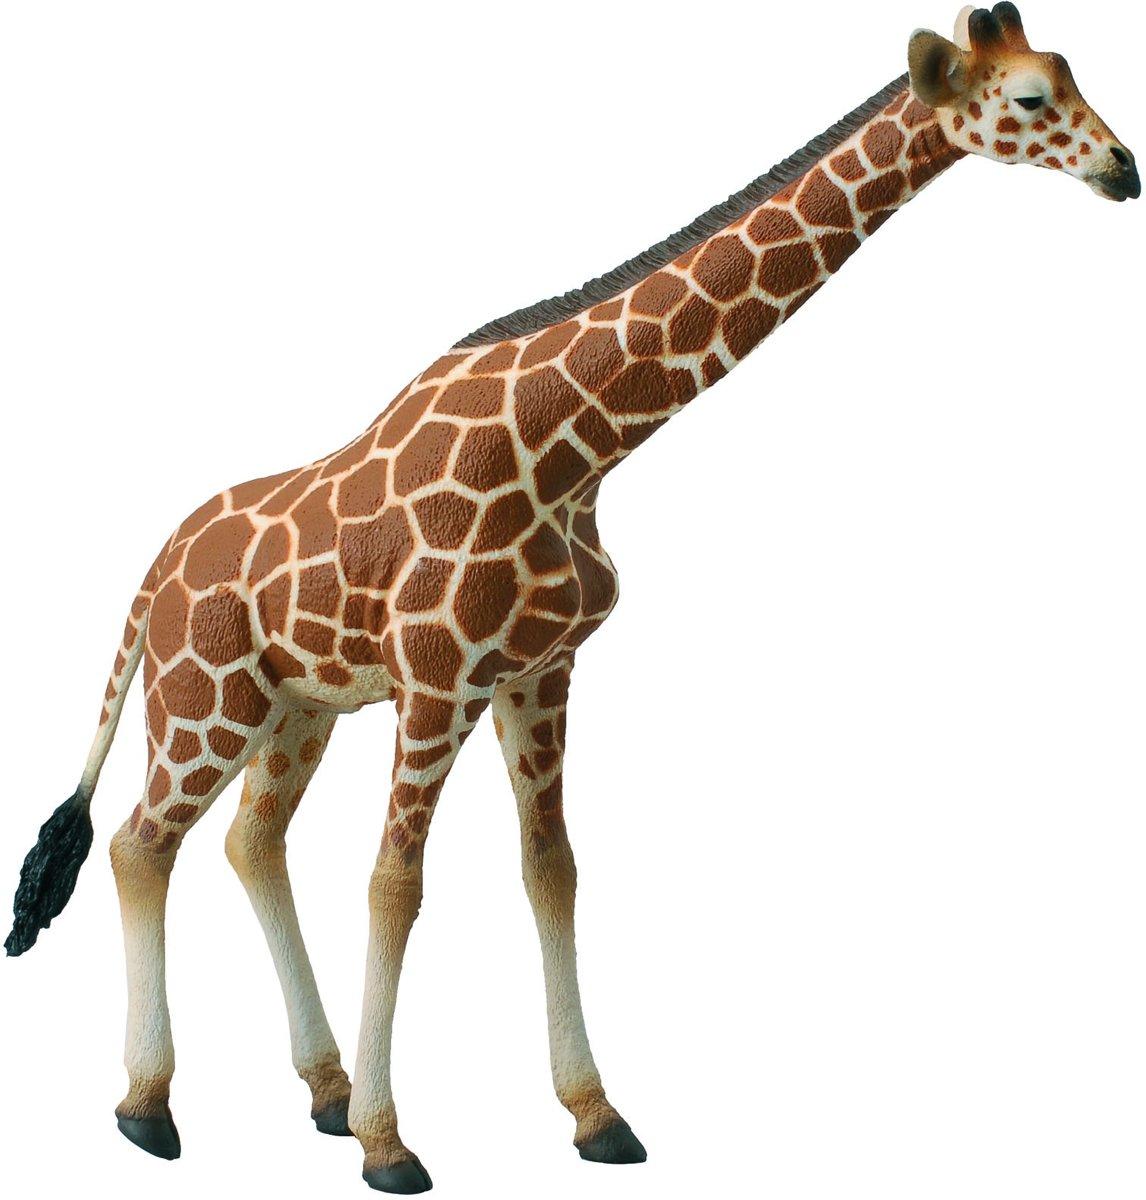 Collecta Wilde Dieren Giraf 15.5 X 16.5 Cm kopen